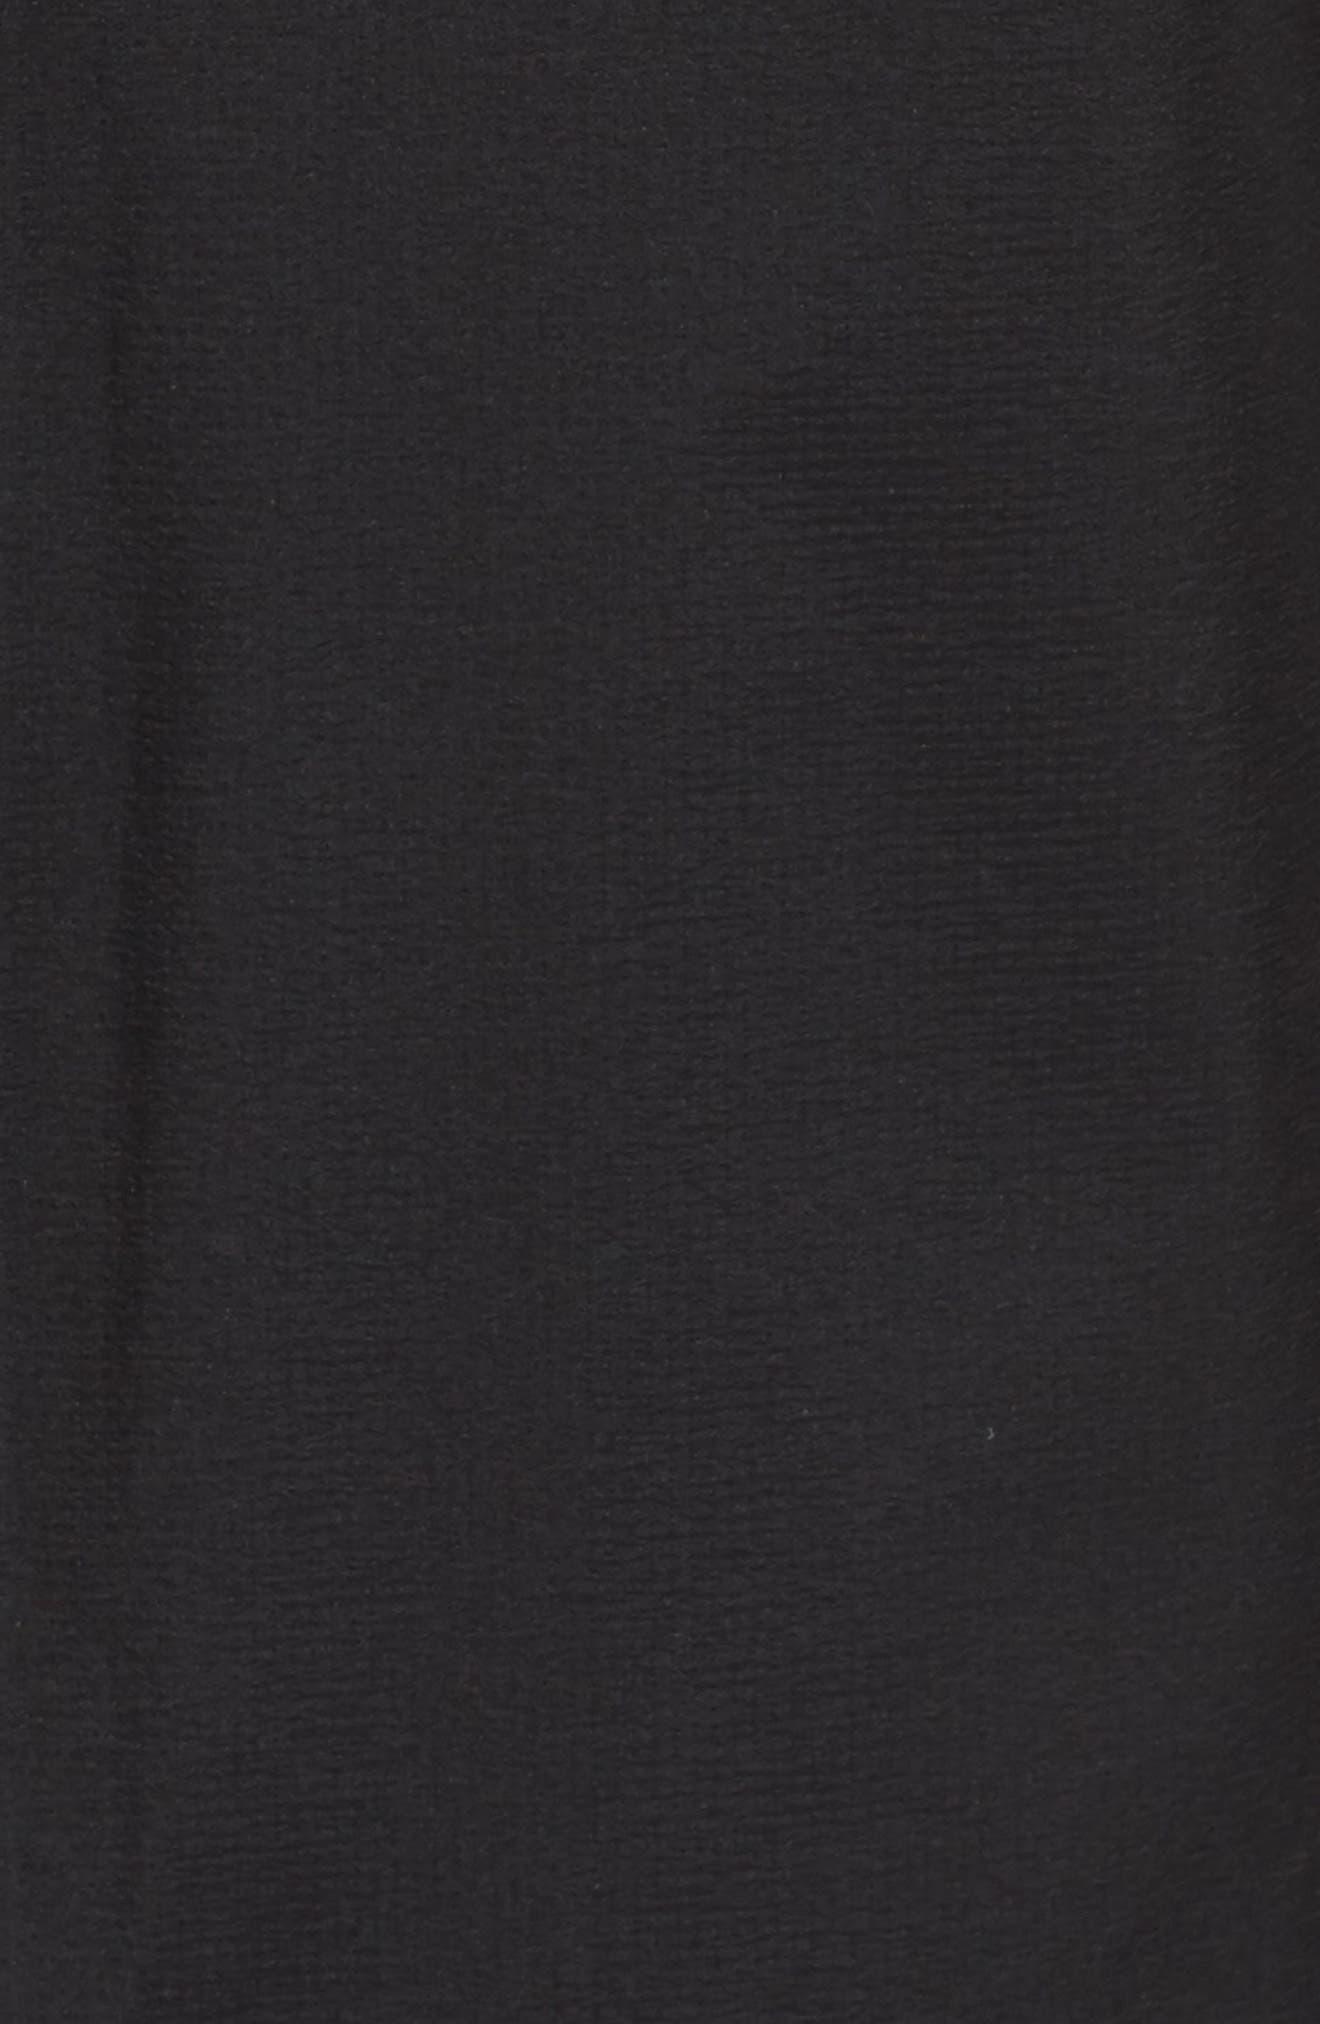 Storm Racer Jacket,                             Alternate thumbnail 7, color,                             BLACK